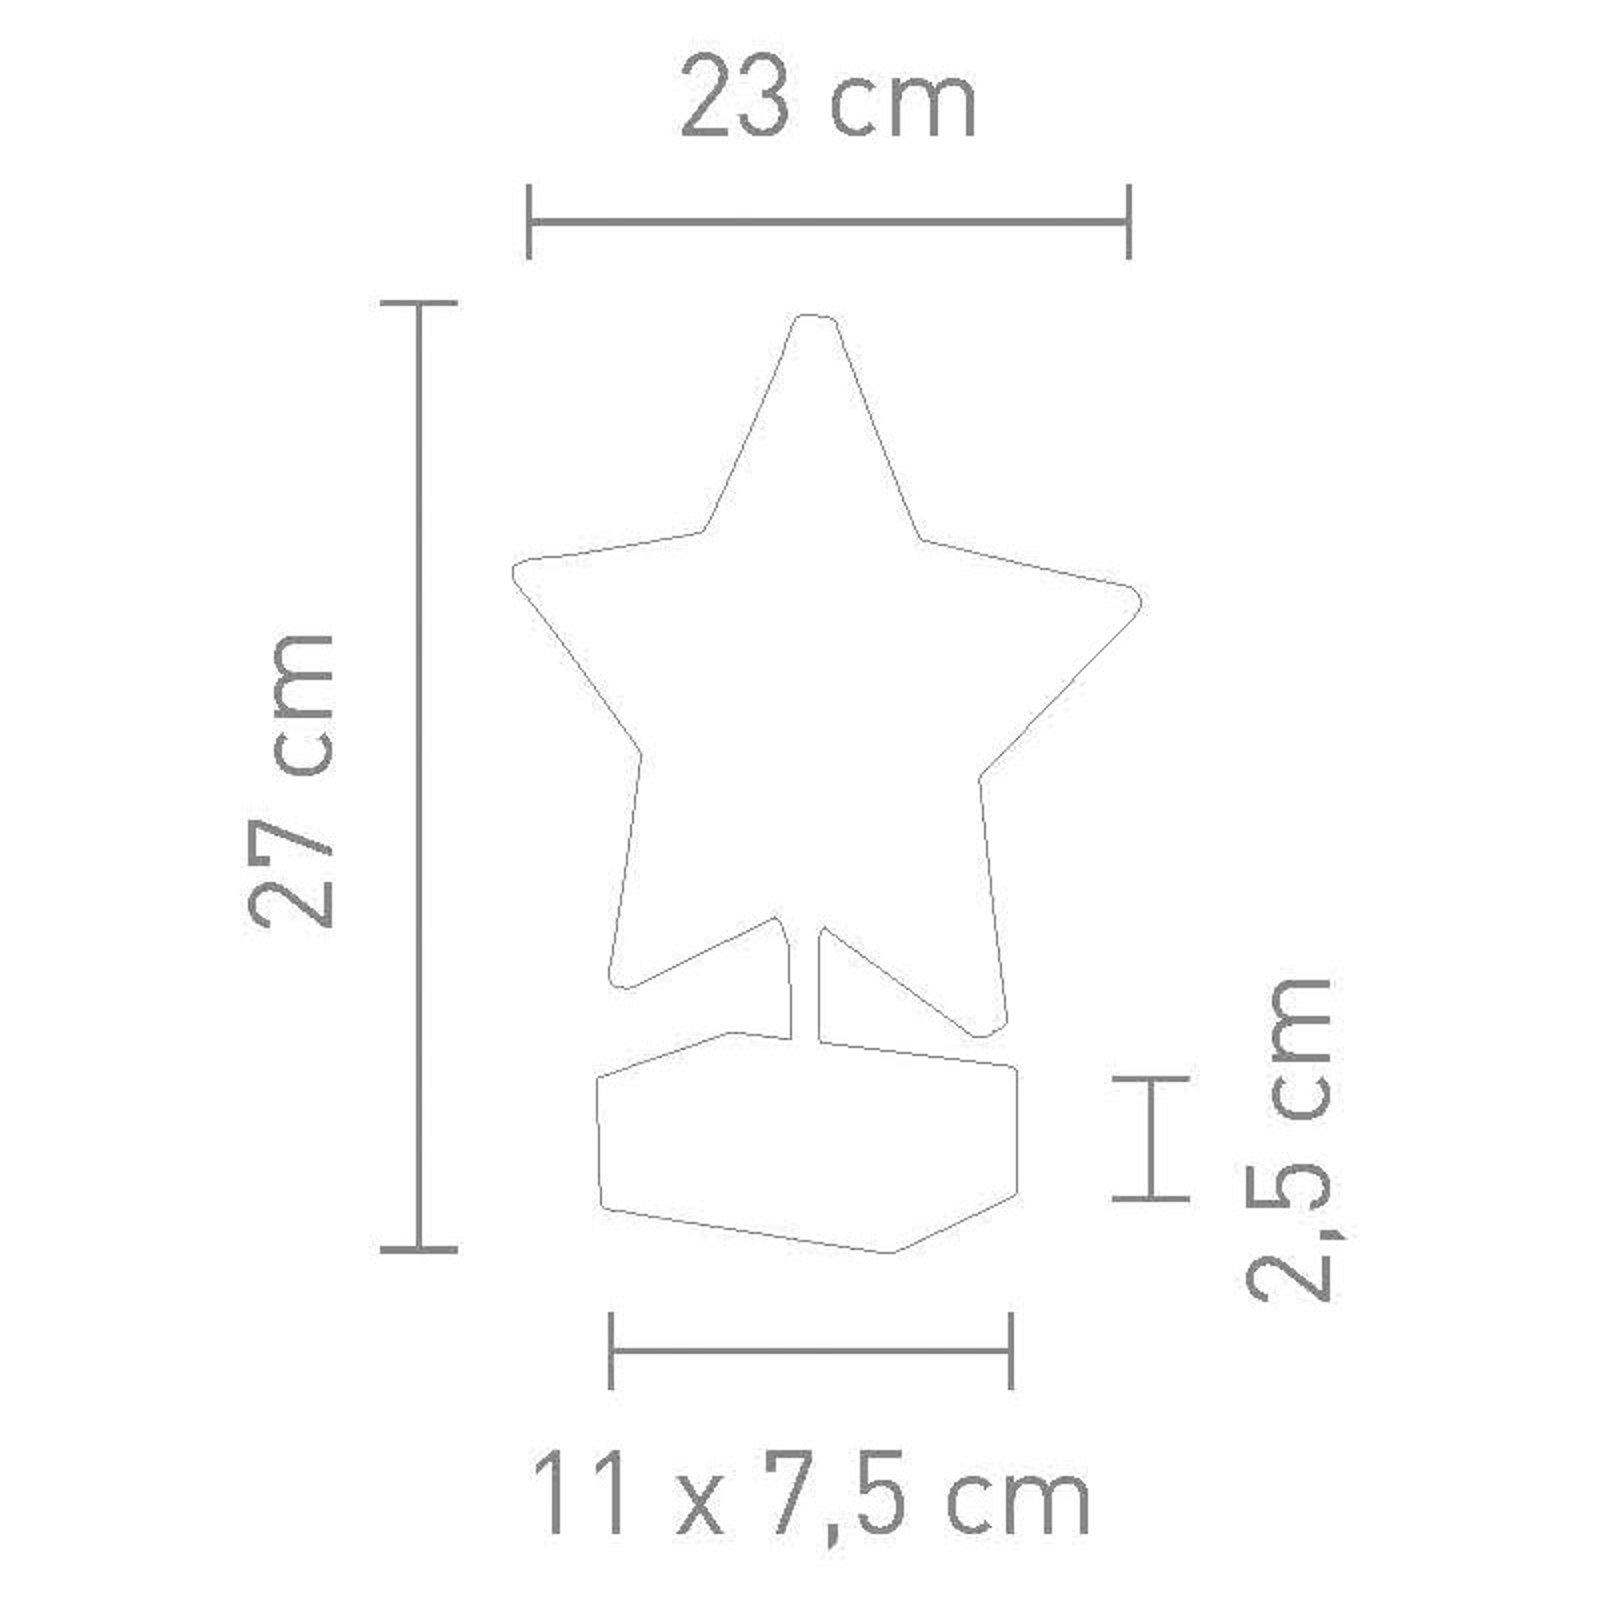 Bordlampe Stella i stjerneform, høyde 27 cm, rød